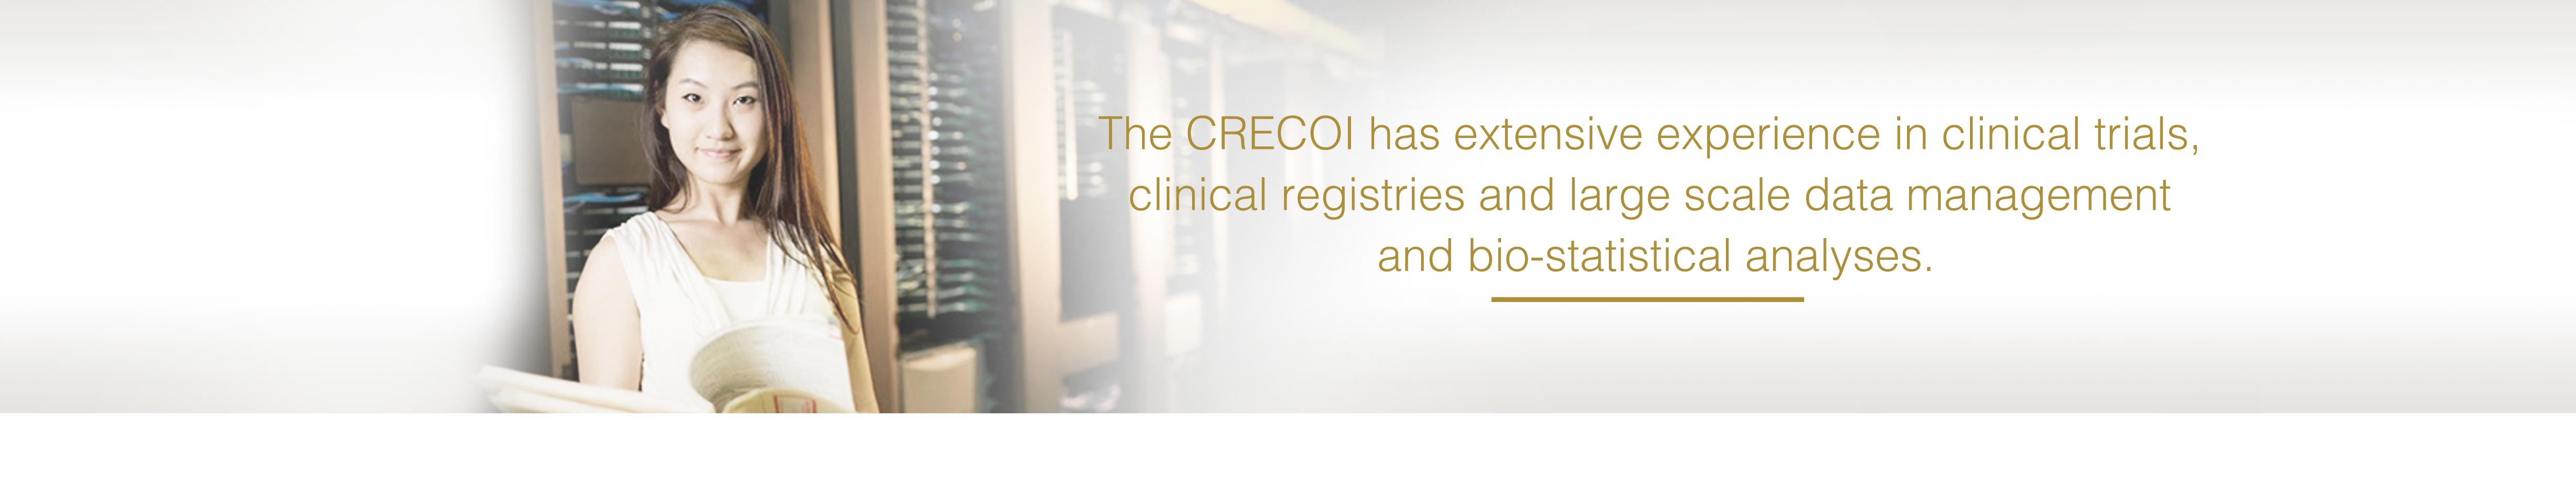 CRECOI_Clinical_Trials